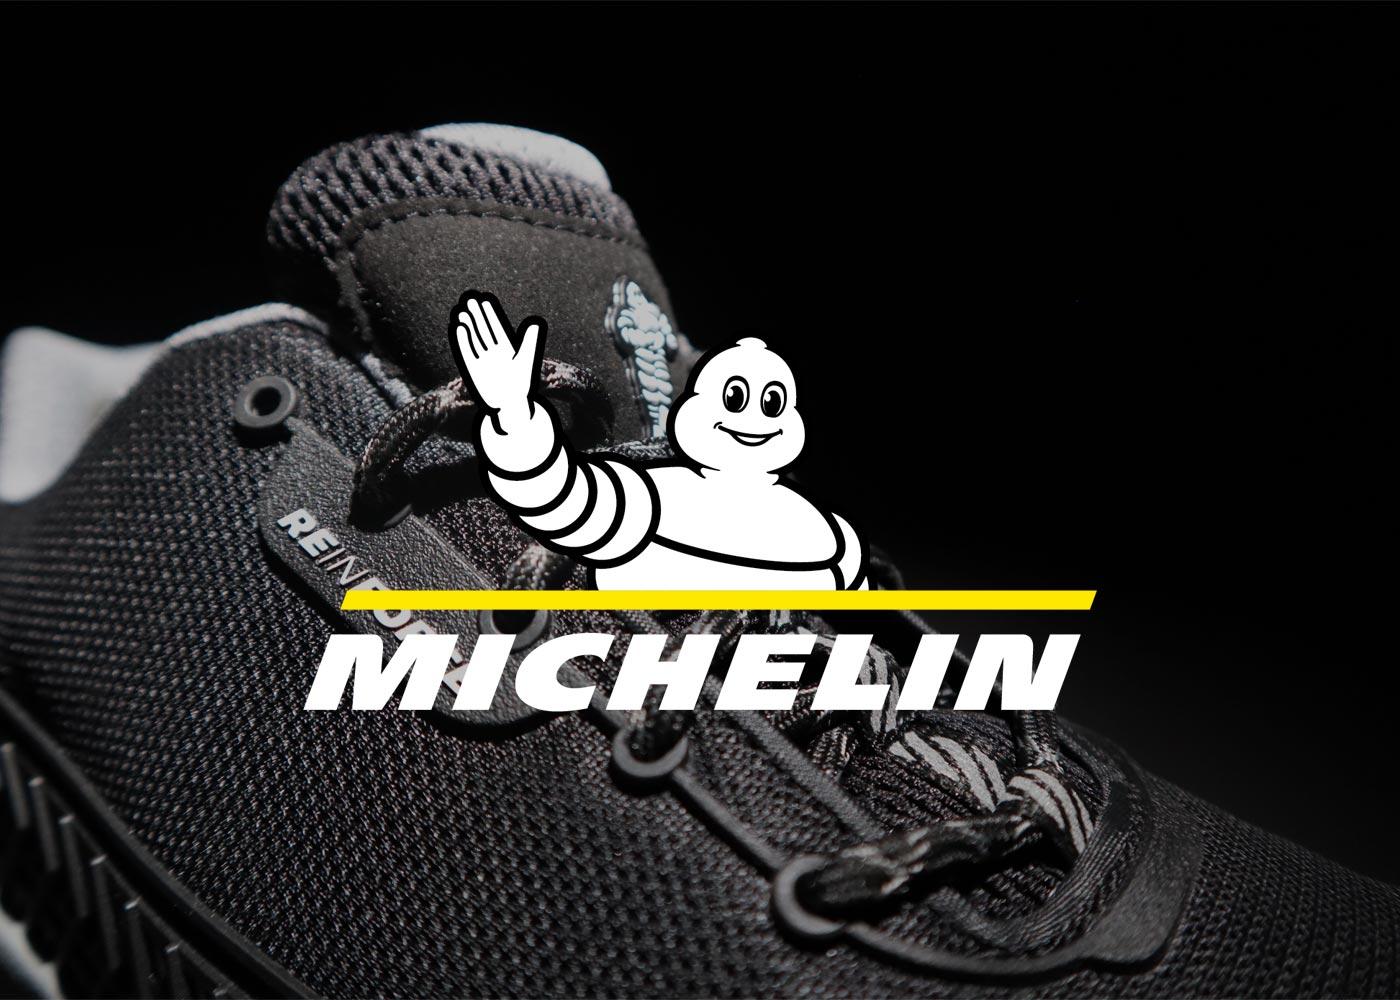 Michelin Brand